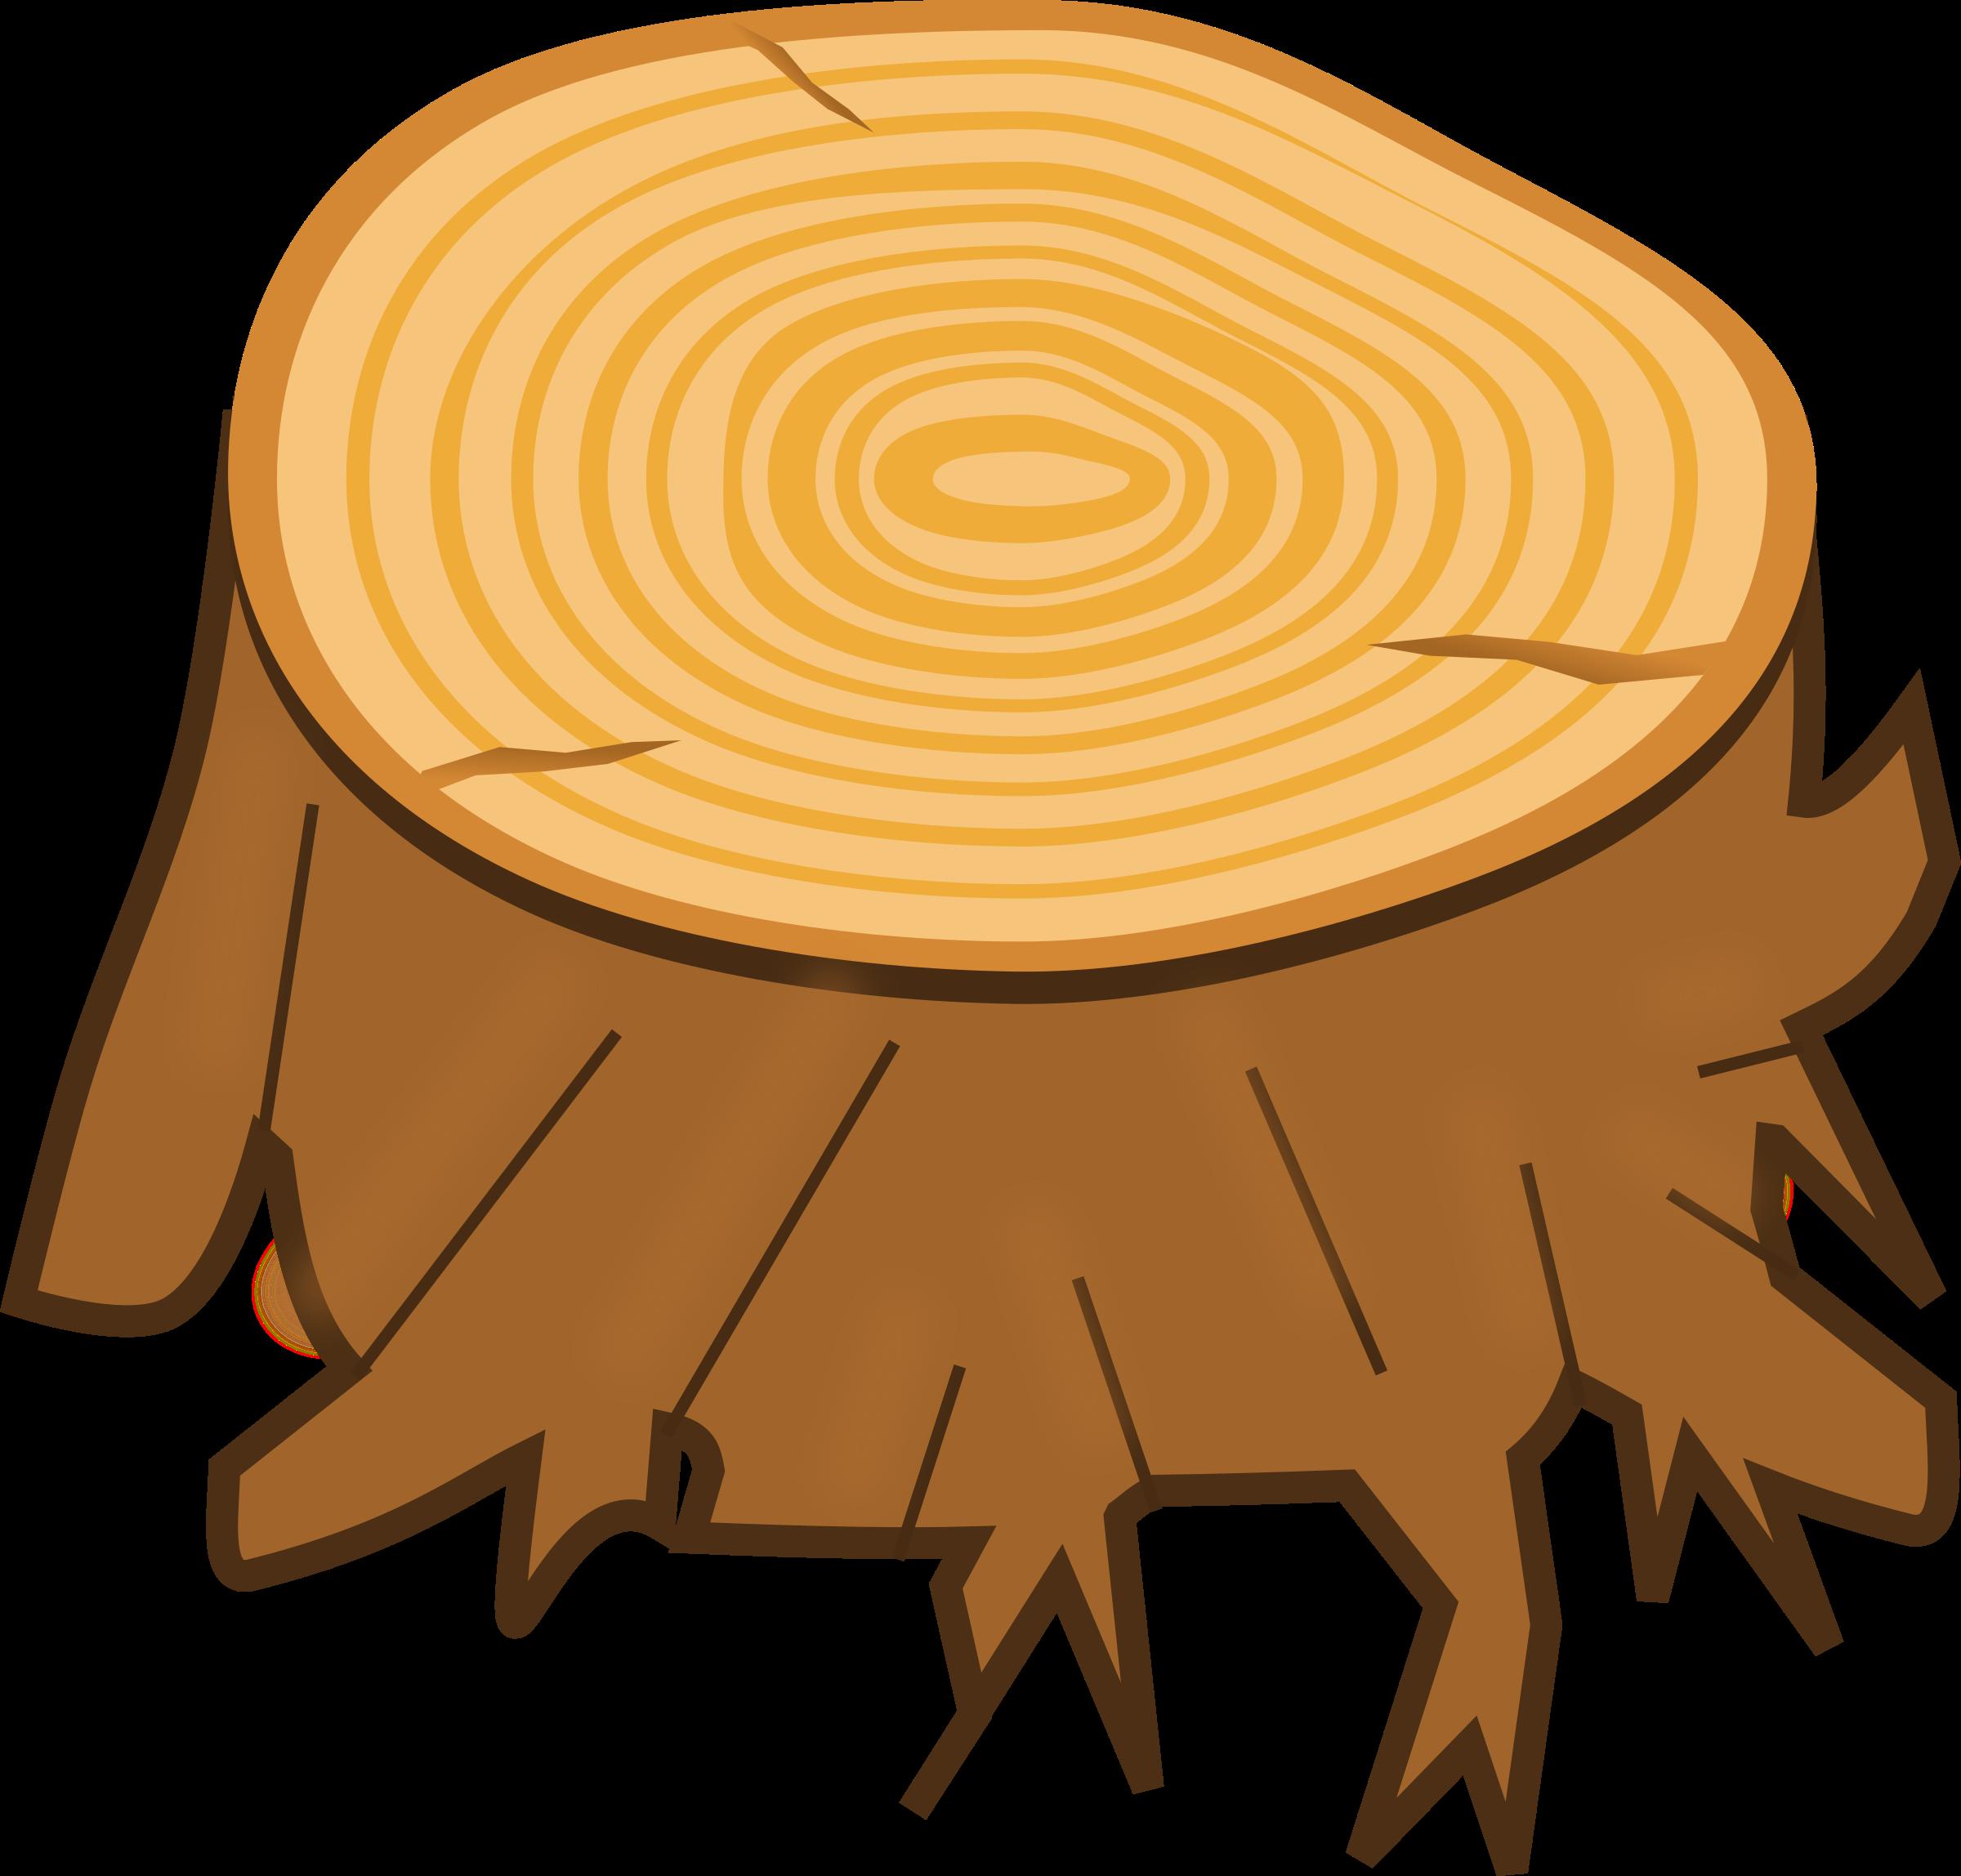 Tree stump clipart transparent.